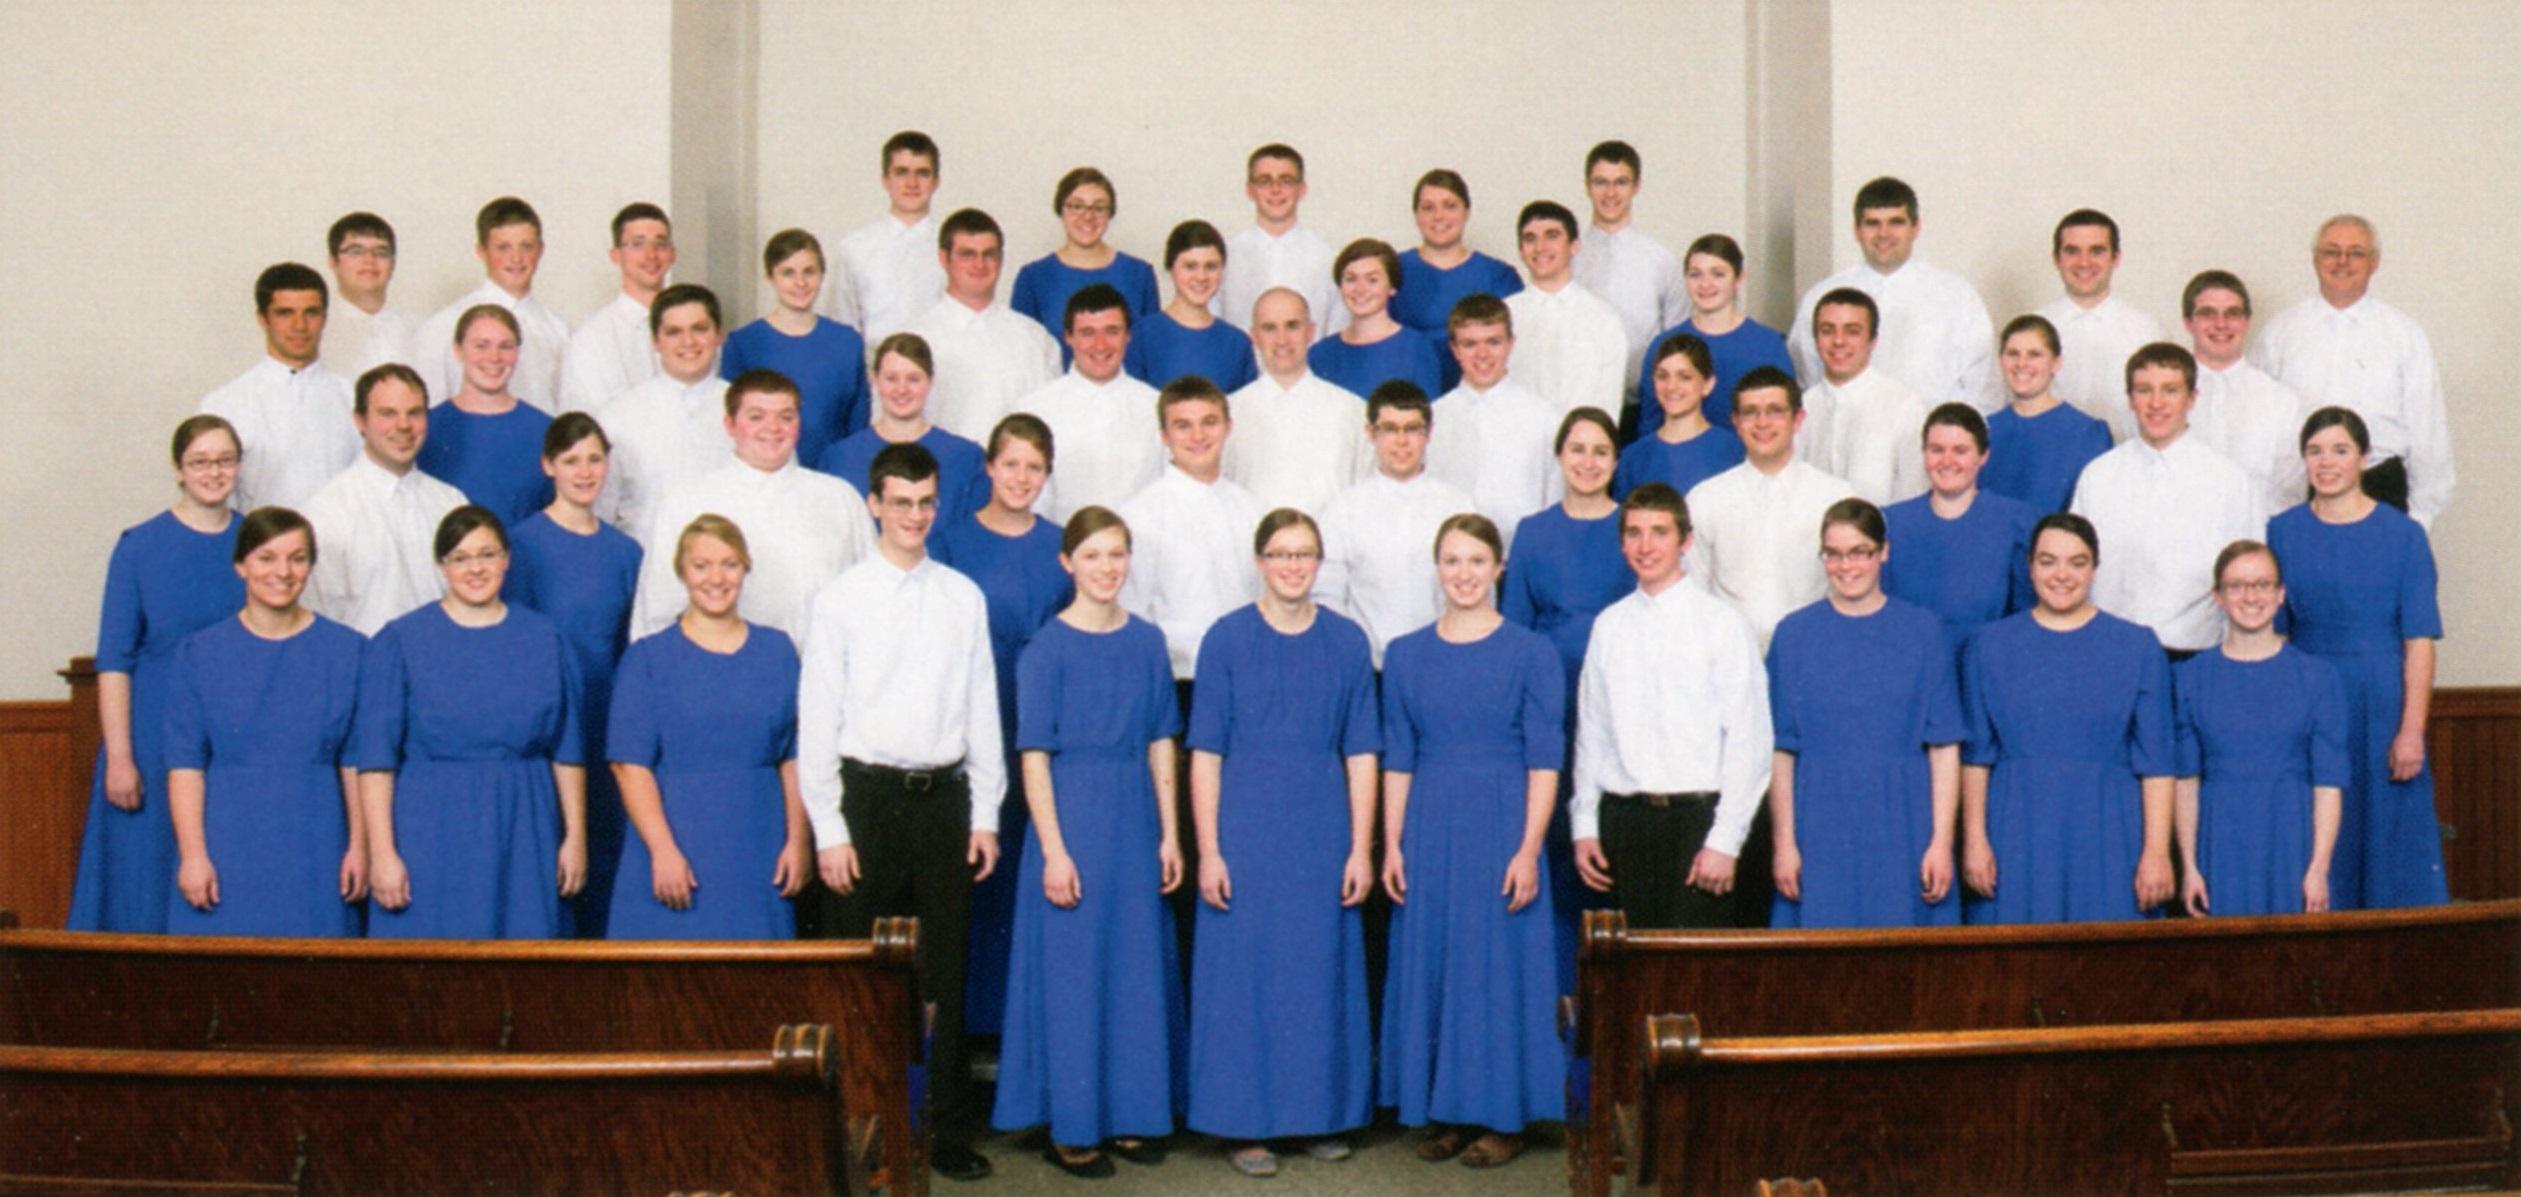 joyful-hearts-chorus-singers.jpg